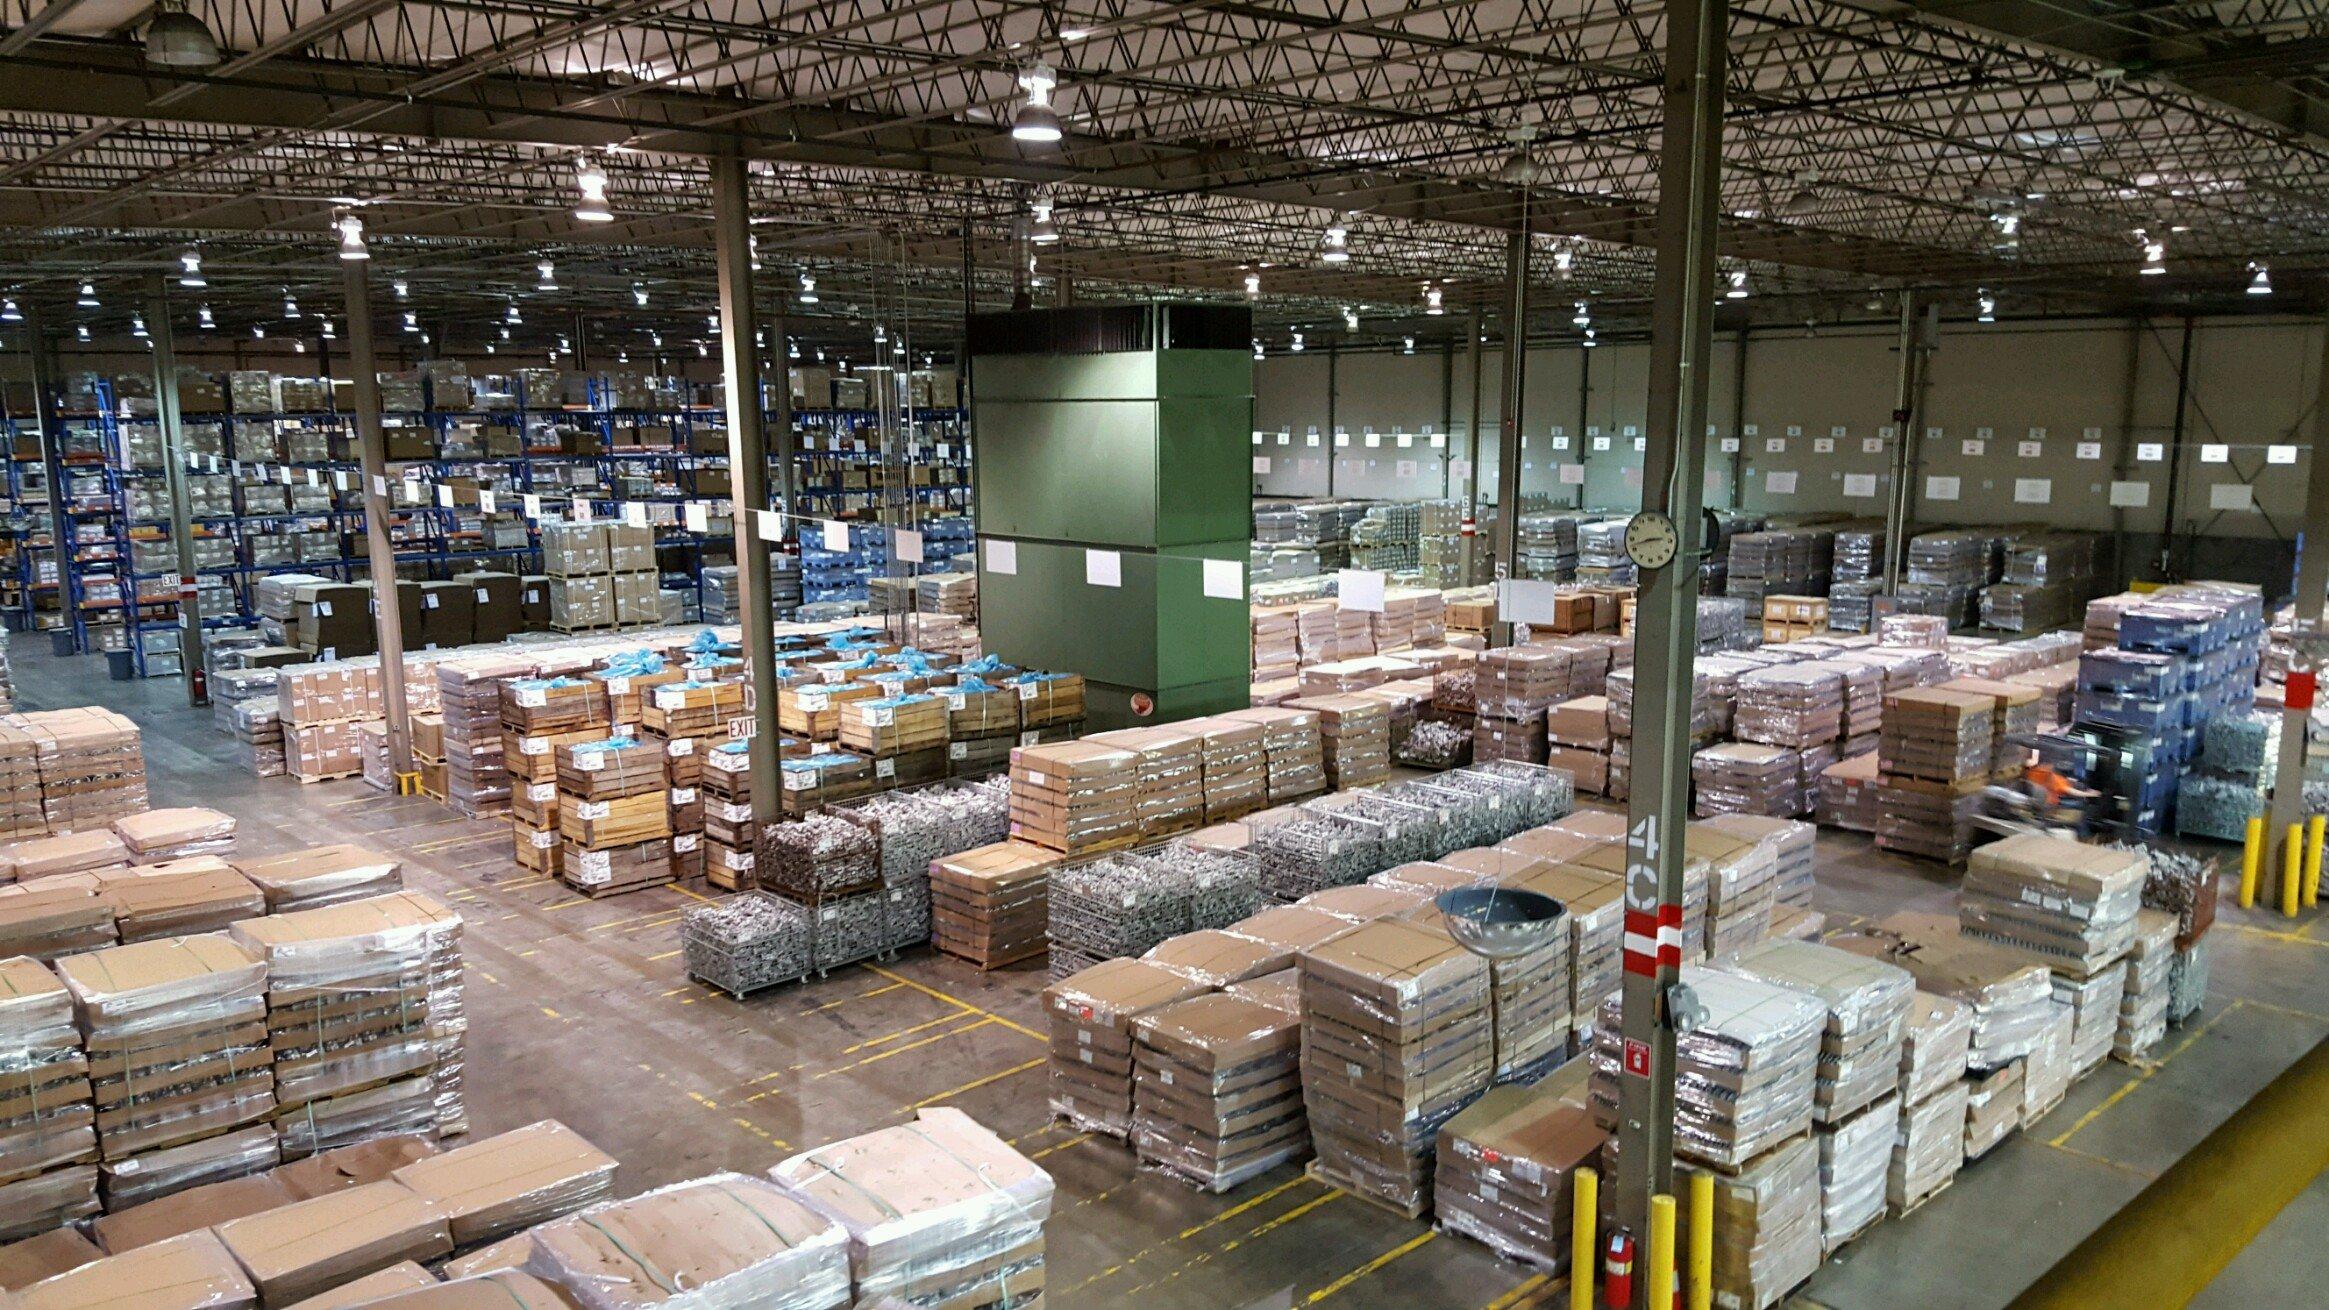 Mattoon Warehouse .IMG_20160225_191602.jpg